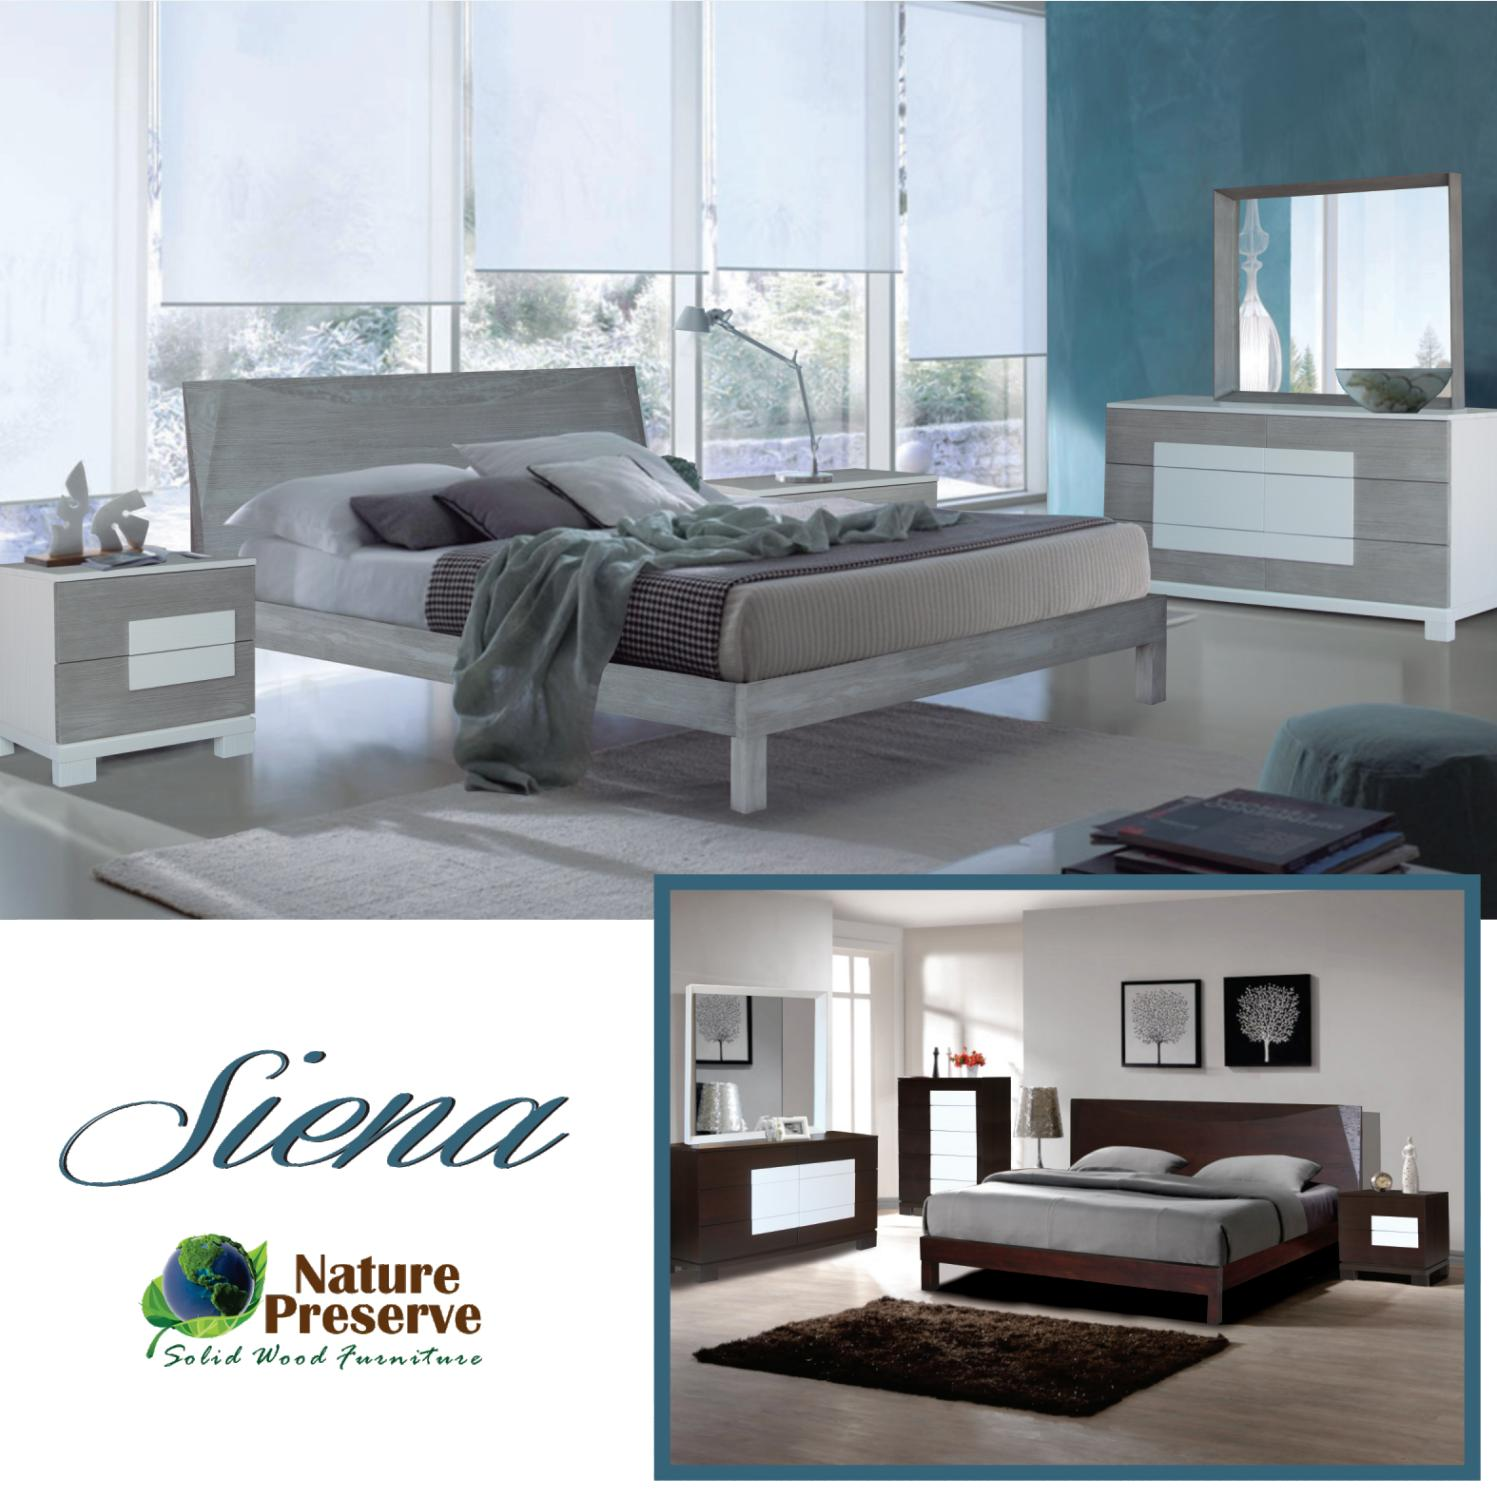 Beau Siena By BFG Rotta Furniture   Issuu